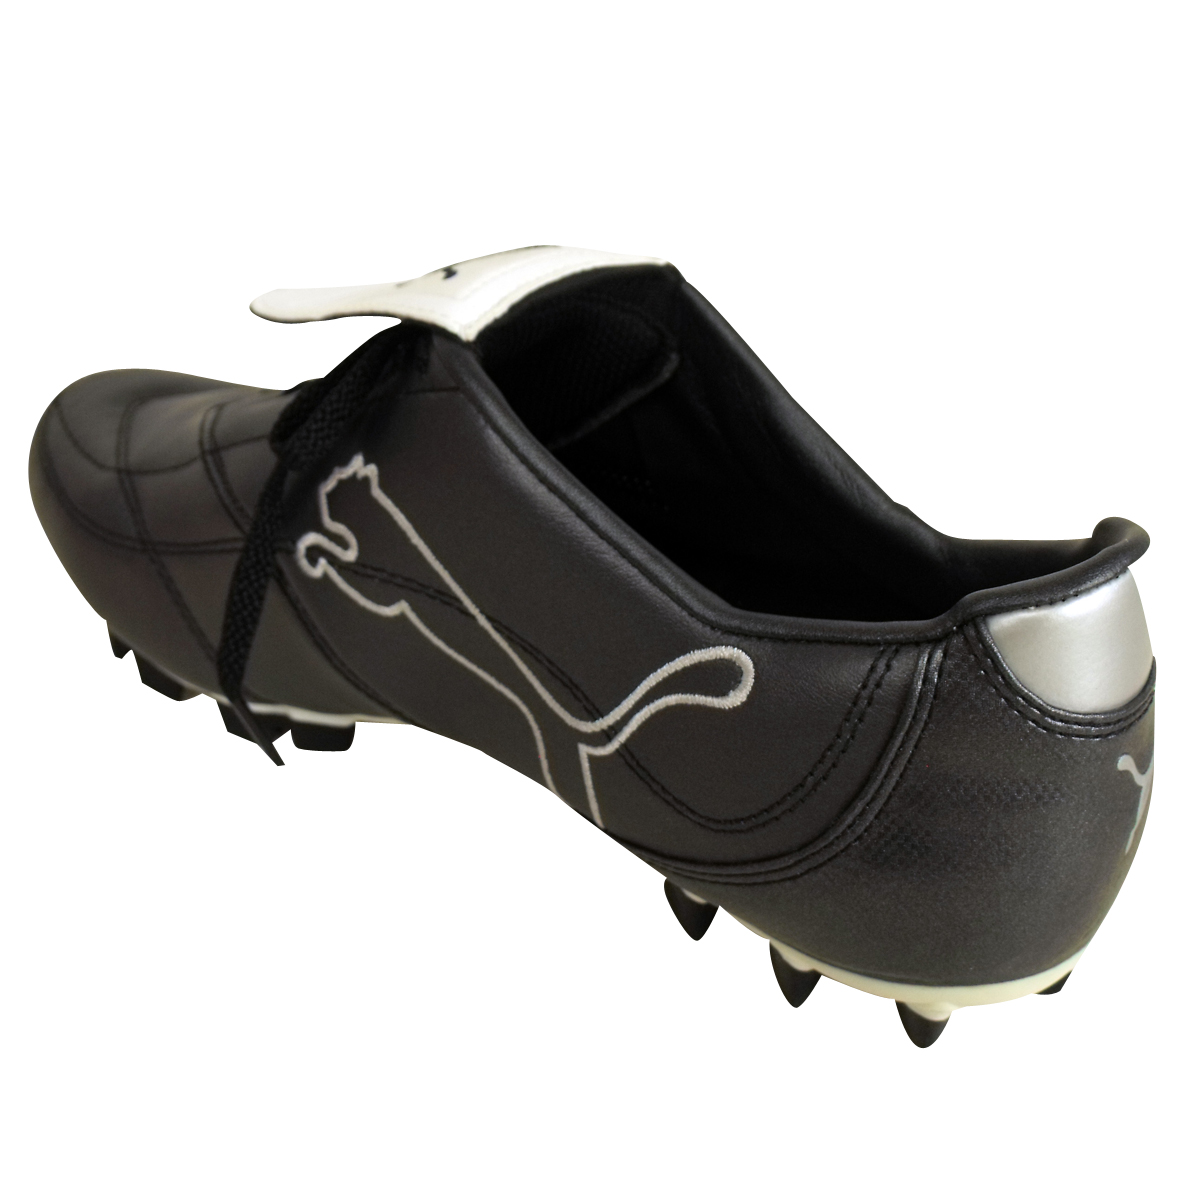 mens vencida ii gci fg firm ground leather football